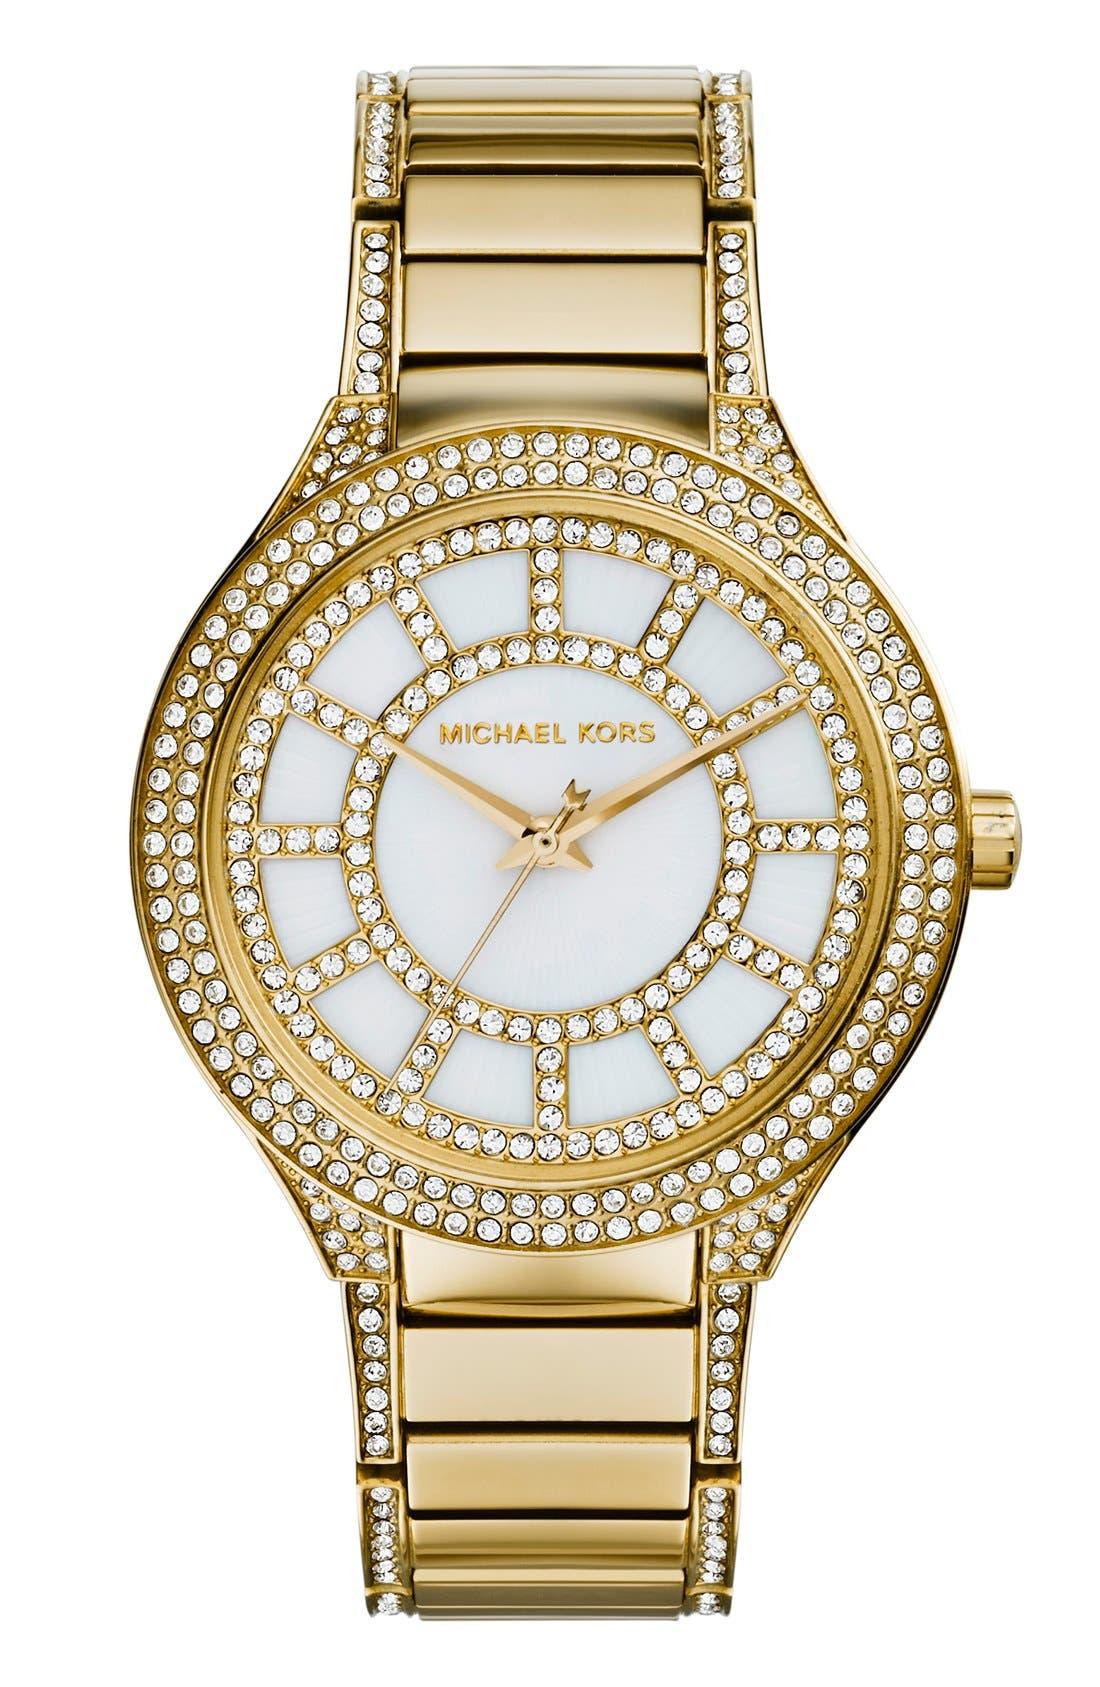 Main Image - Michael Kors 'Kerry' Crystal Accent Bracelet Watch, 38mm